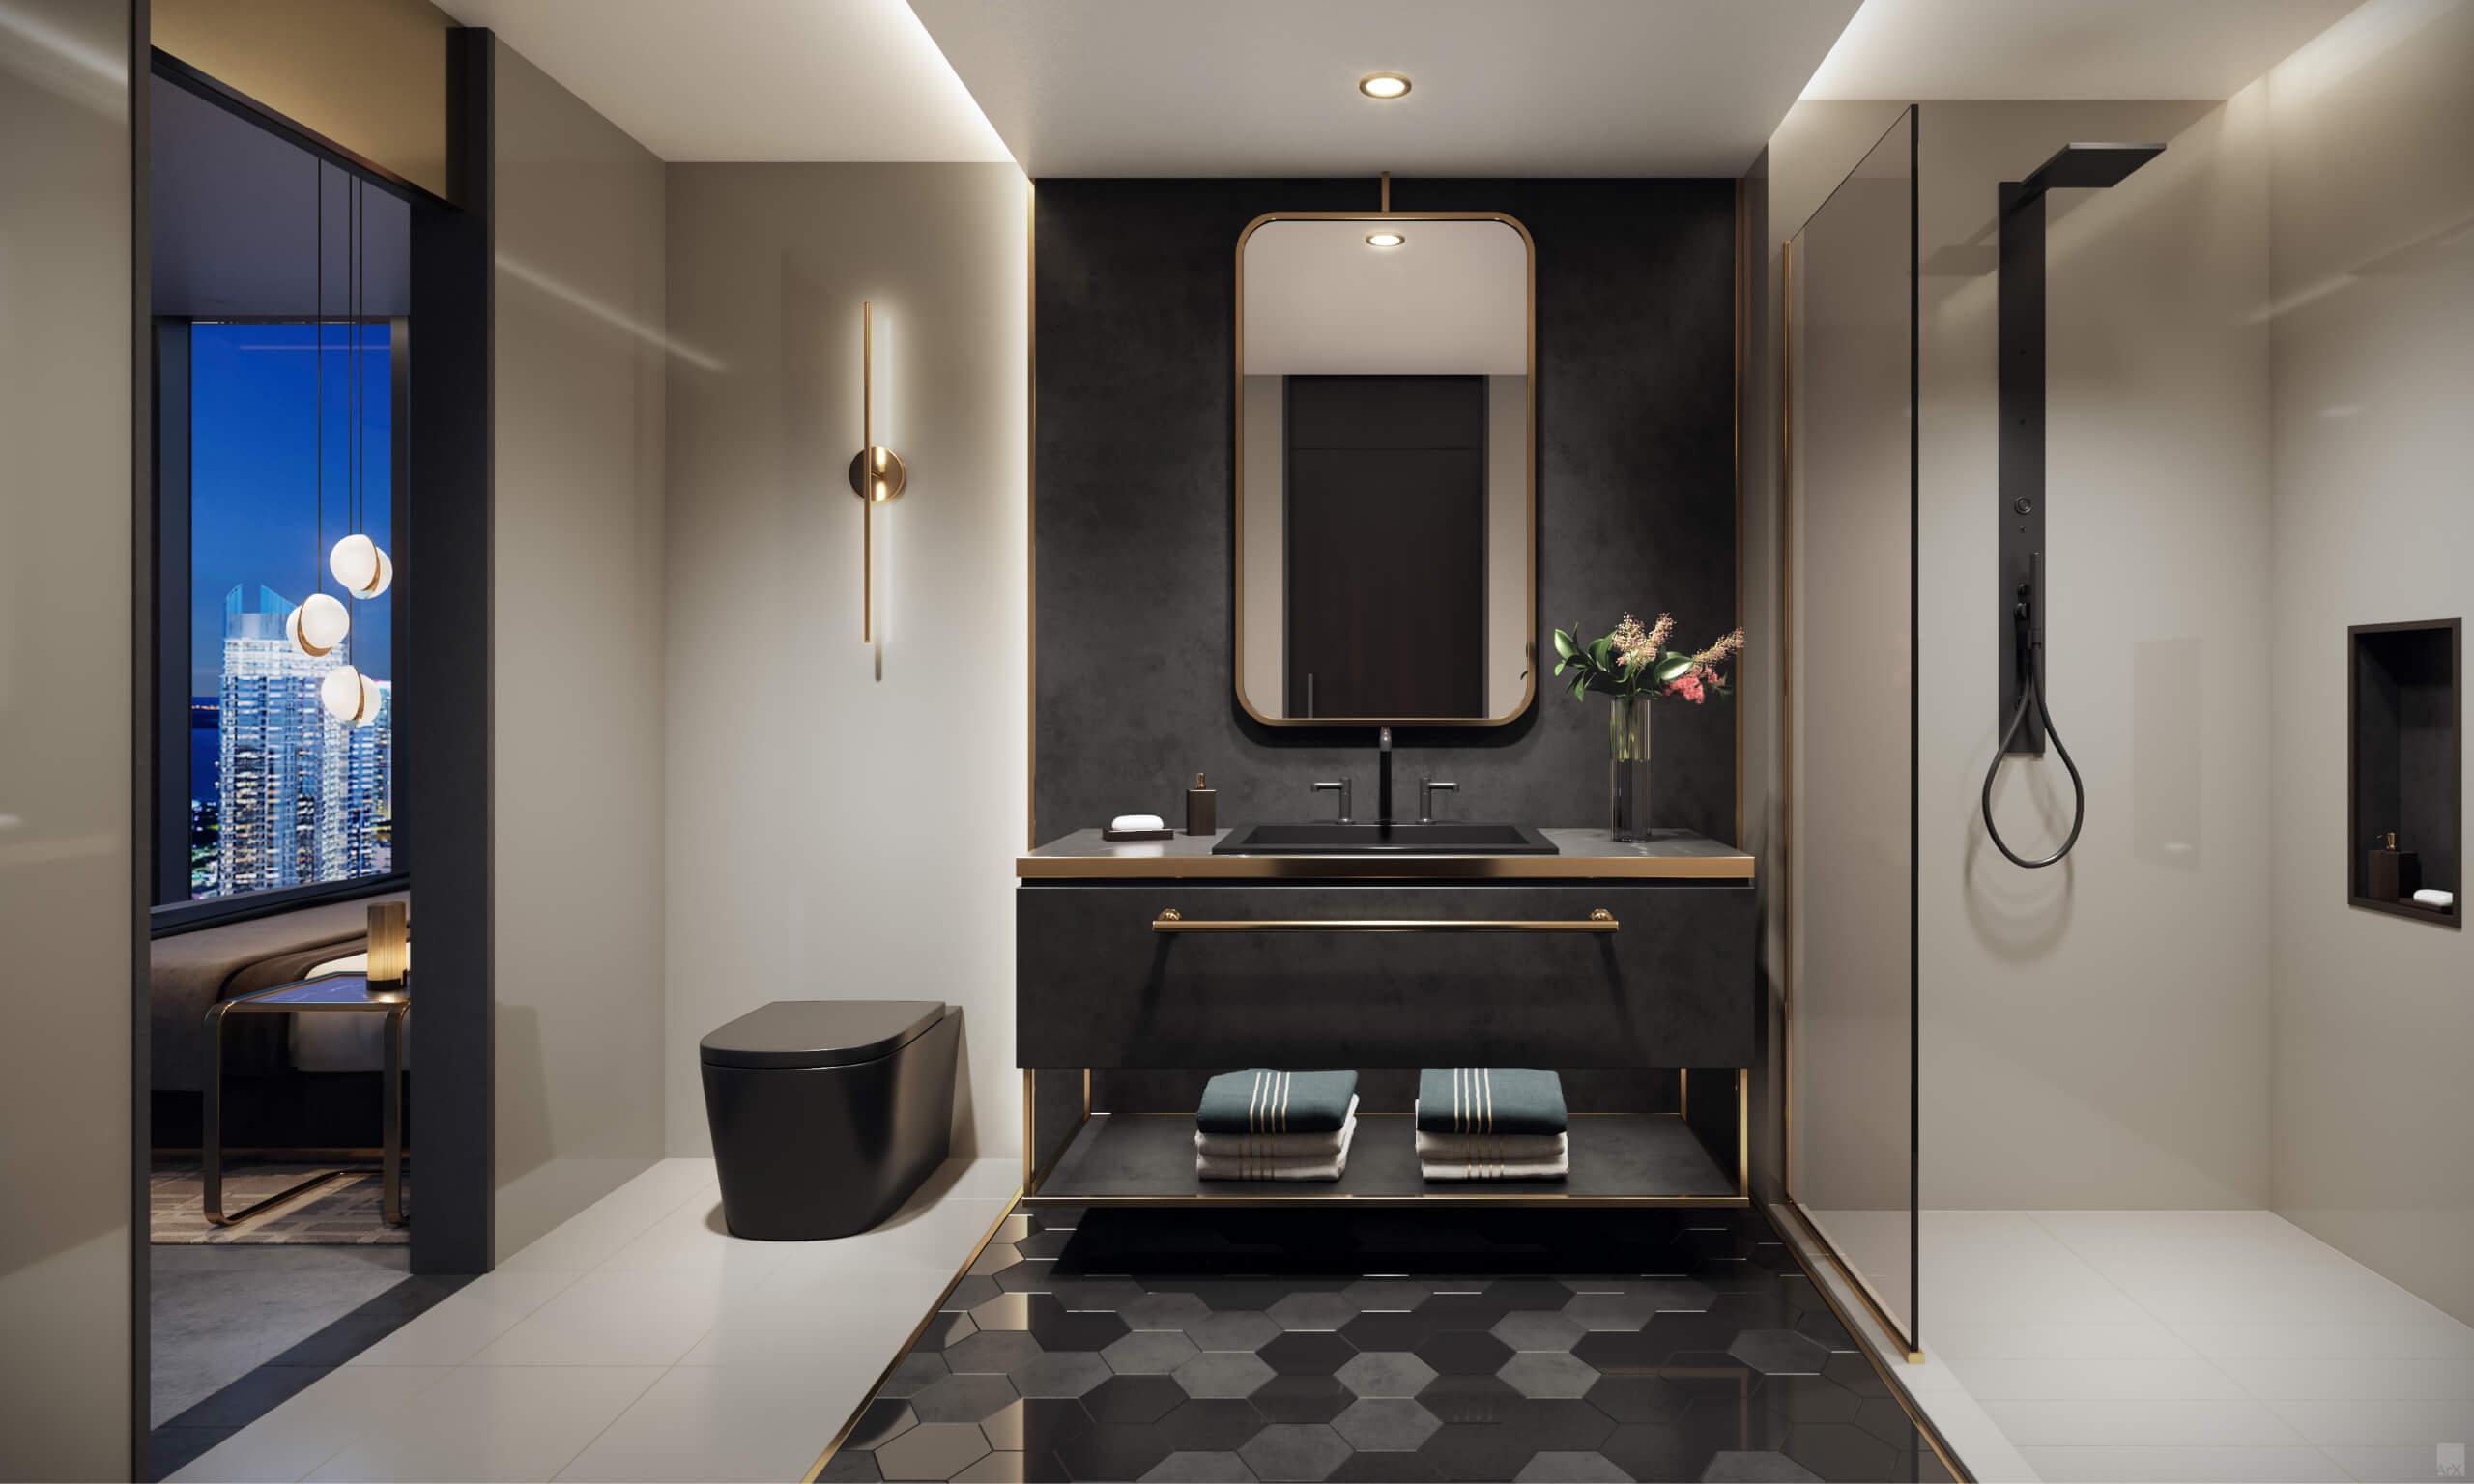 Bathroom. Designed by AvroKO Hospitality Group & Studio Ramirez.